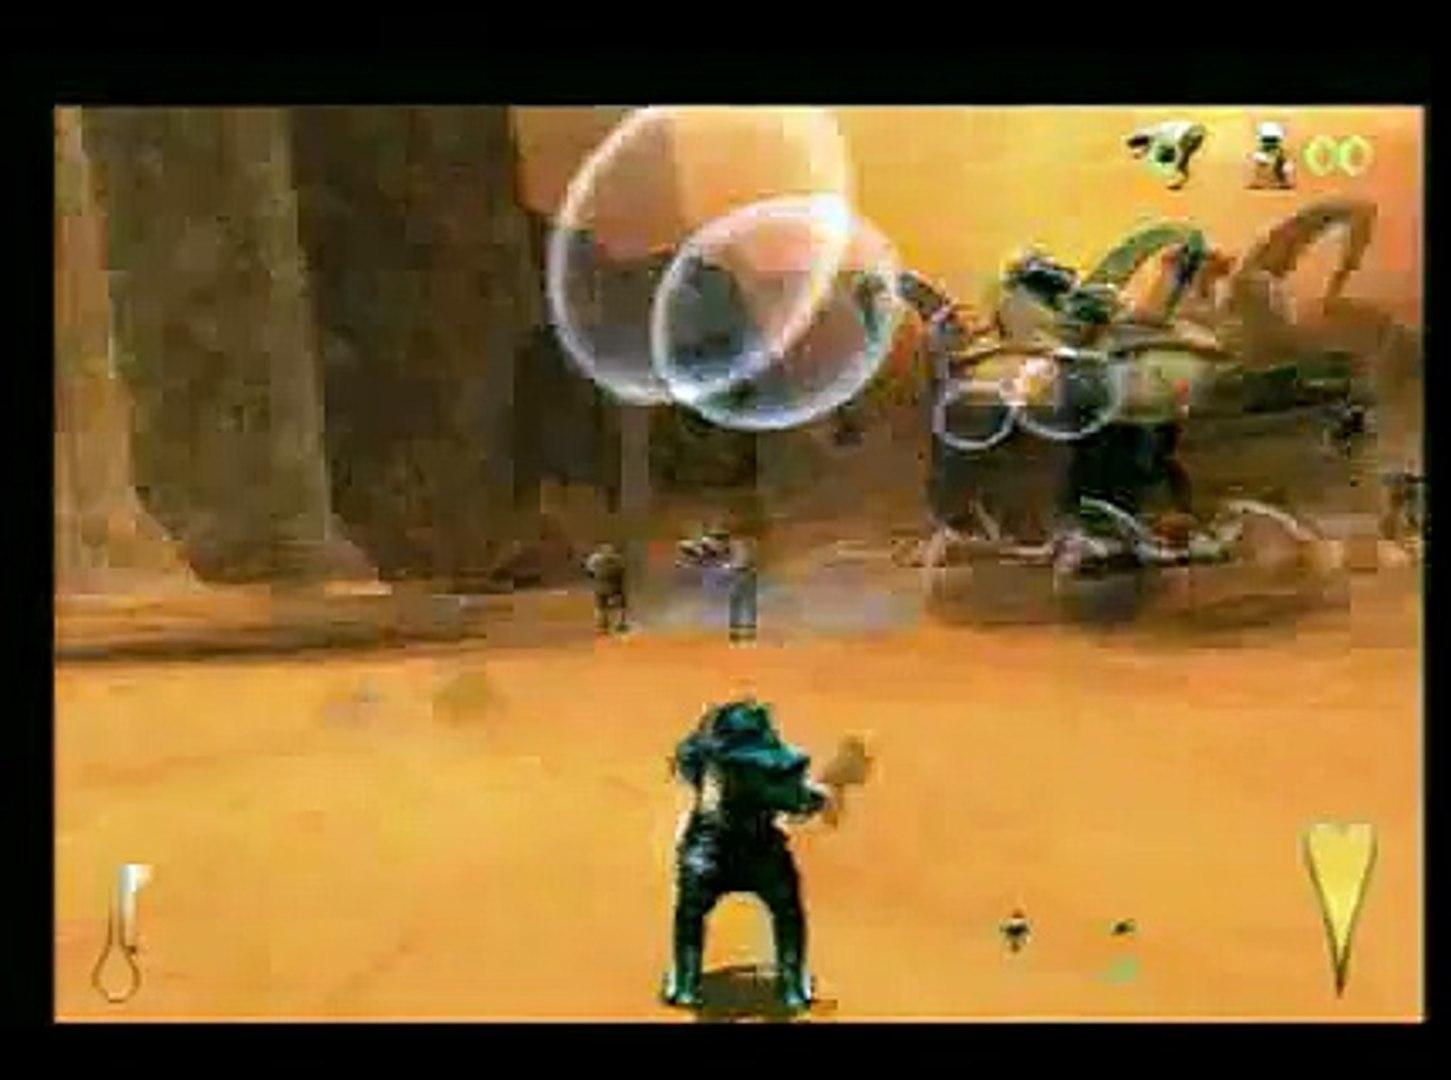 Giants : Citizen Kabuto - Gameplay Meccaryn